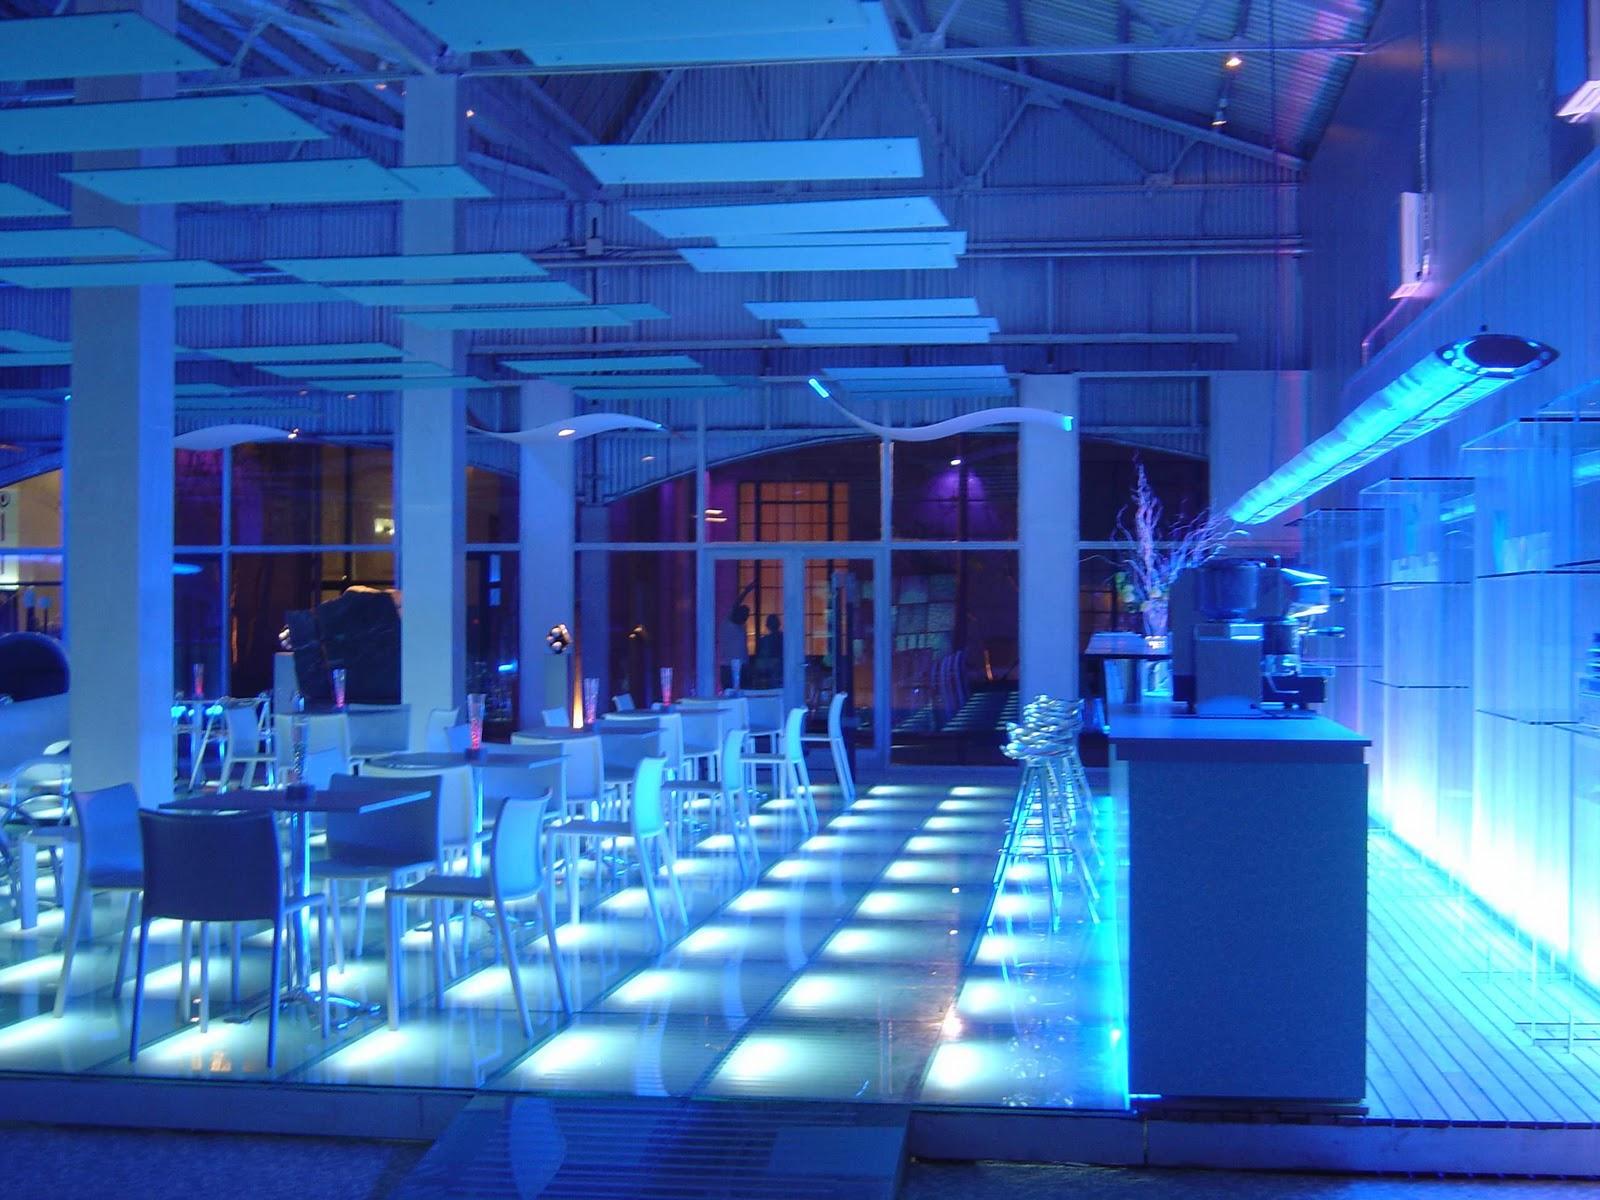 Iluminacion e p s i iluminacion comercial de interiores for Iluminacion minimalista interiores